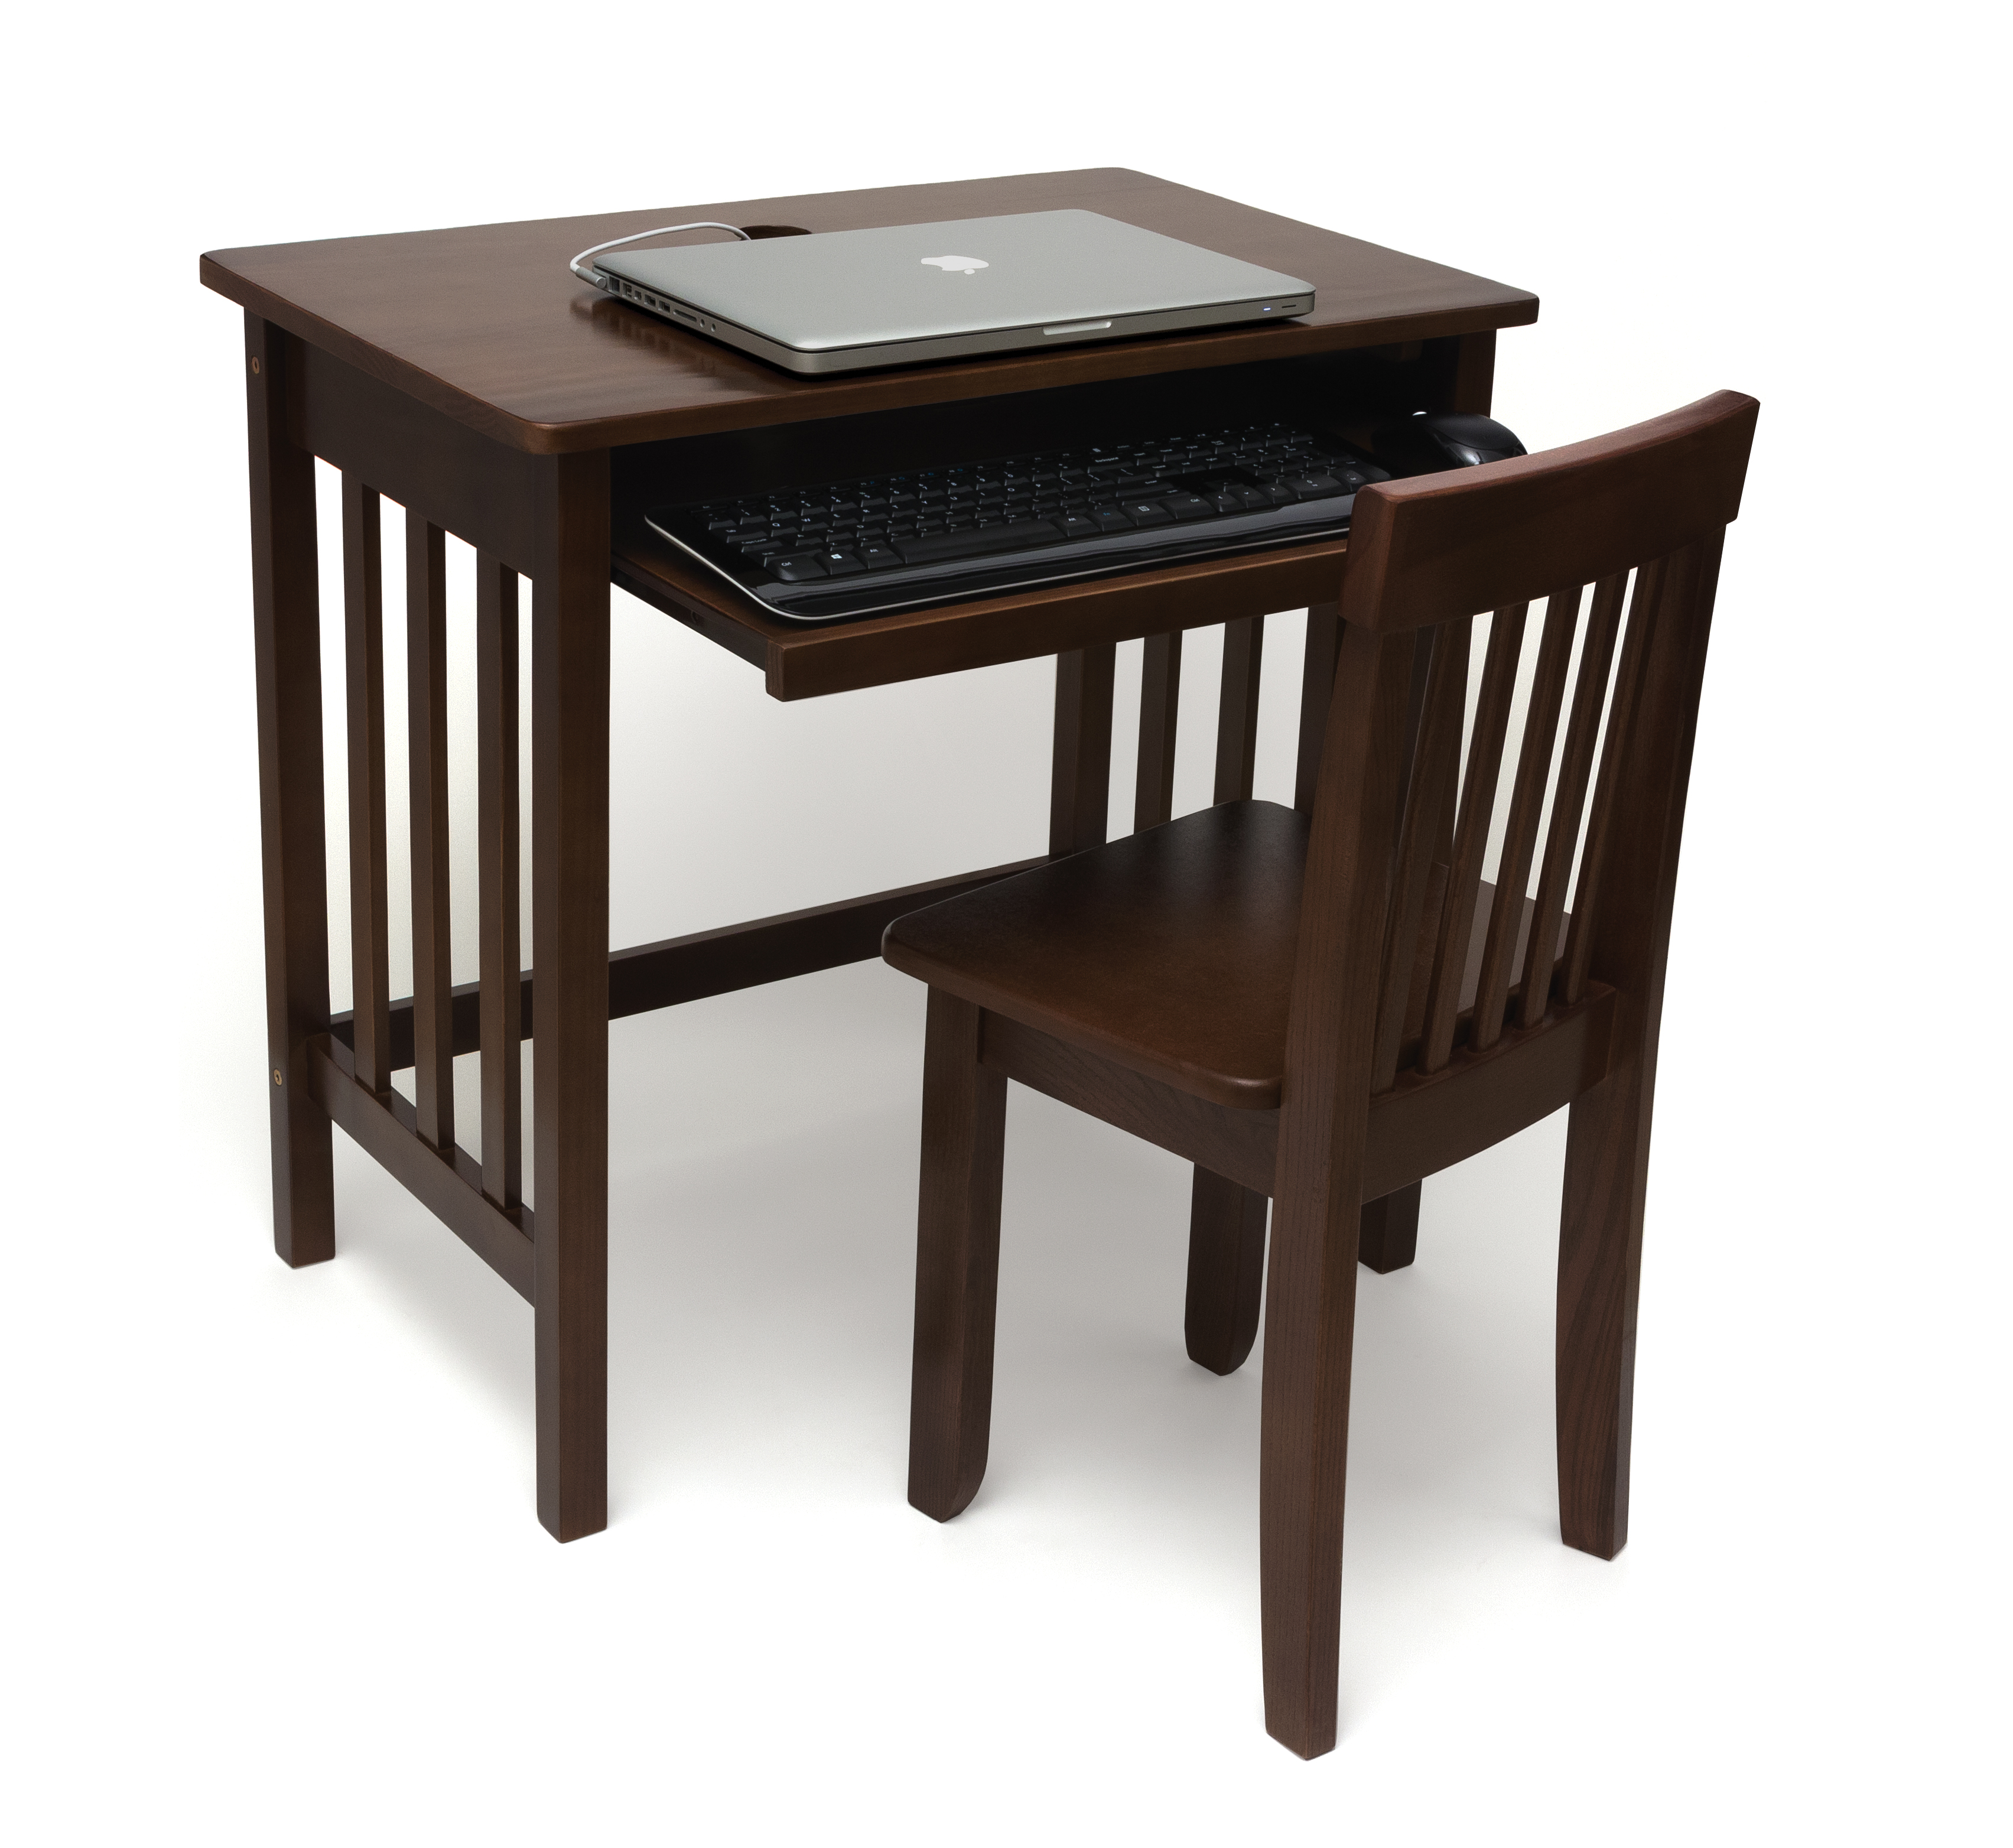 Desk wooden children s desk moulin roty furniture children s desk - Childs Computer Desk And Mystic Chair Walnut Finish Lipper